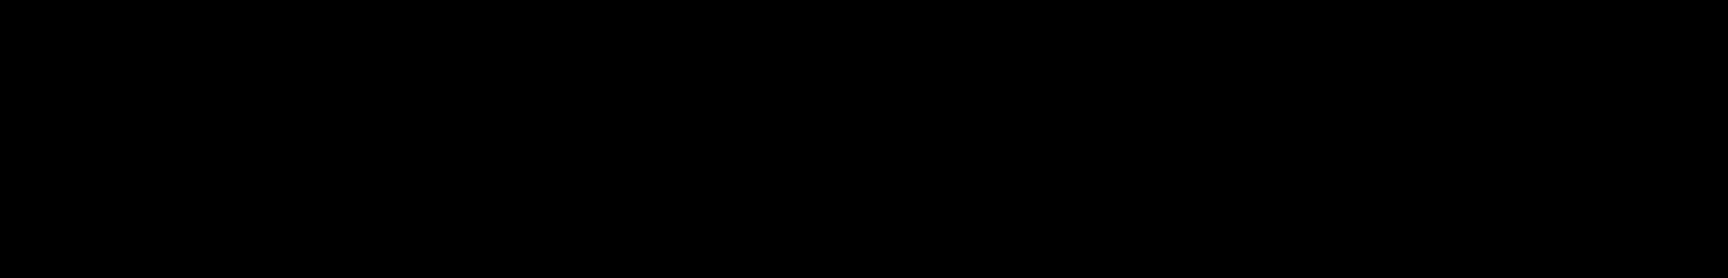 Promethean_Text_Only_Logo_Black_1728x278.png